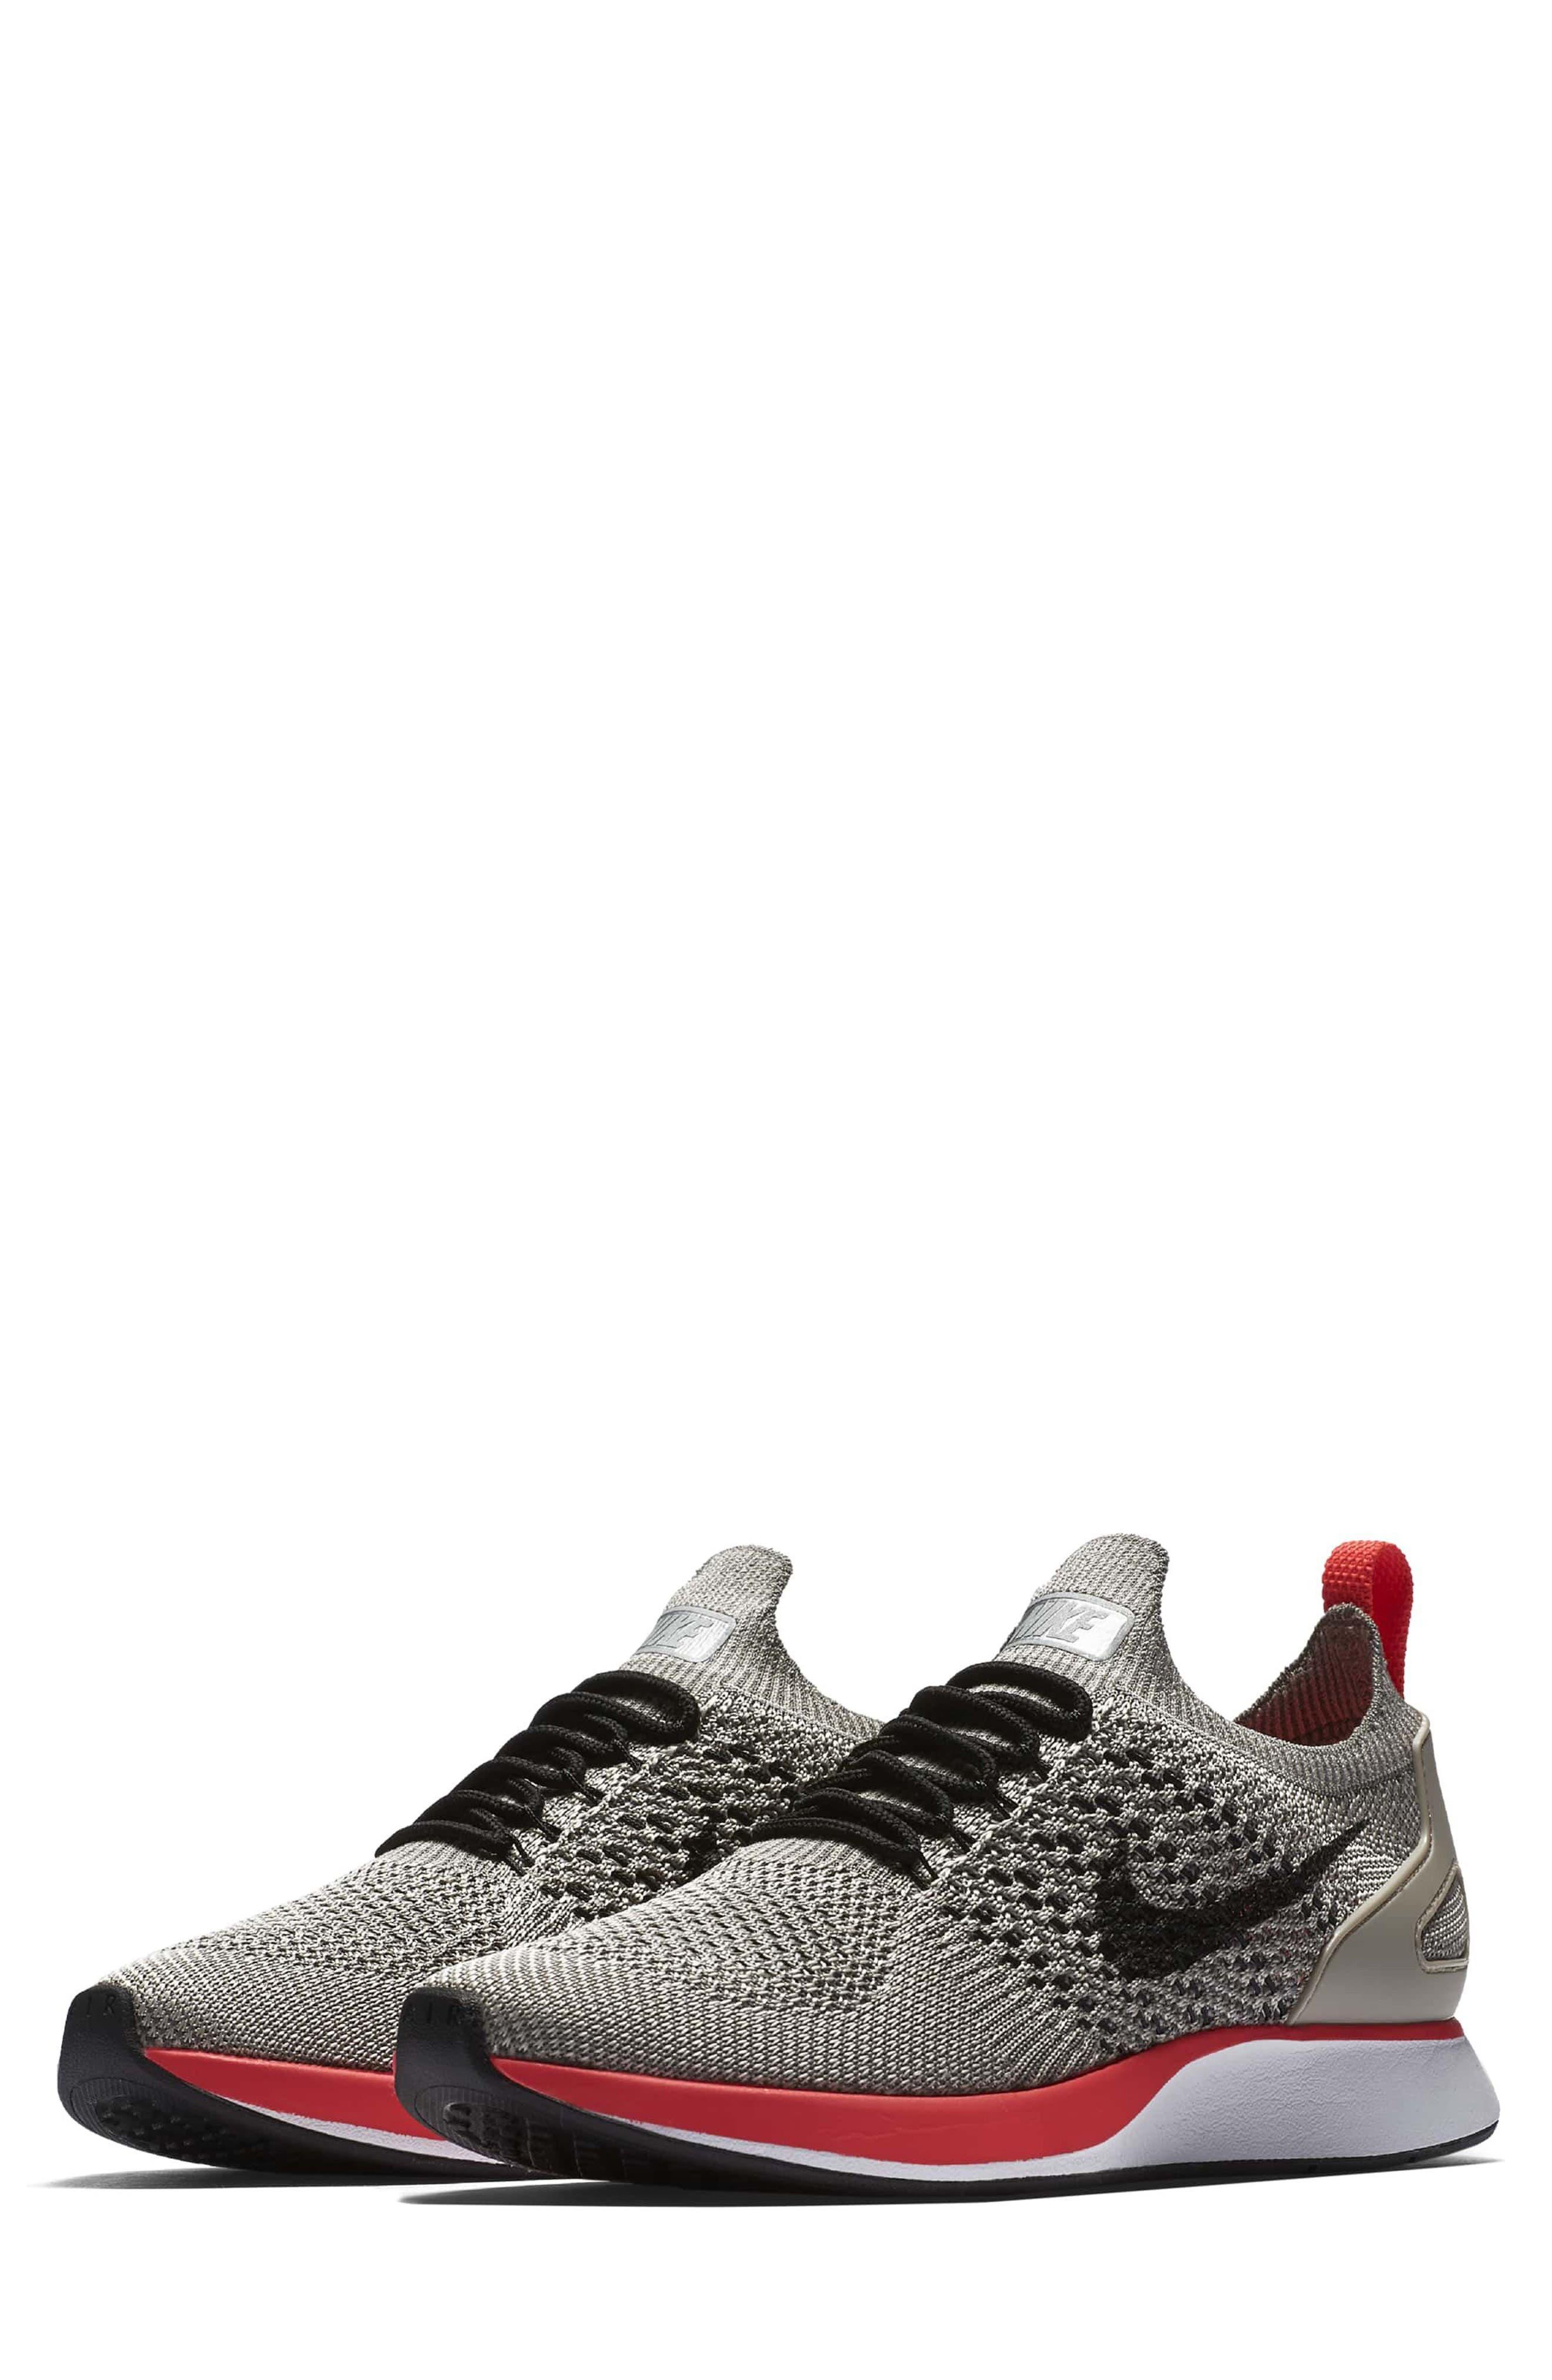 Air Zoom Mariah Flyknit Racer Sneaker,                         Main,                         color, String/ Black/ White